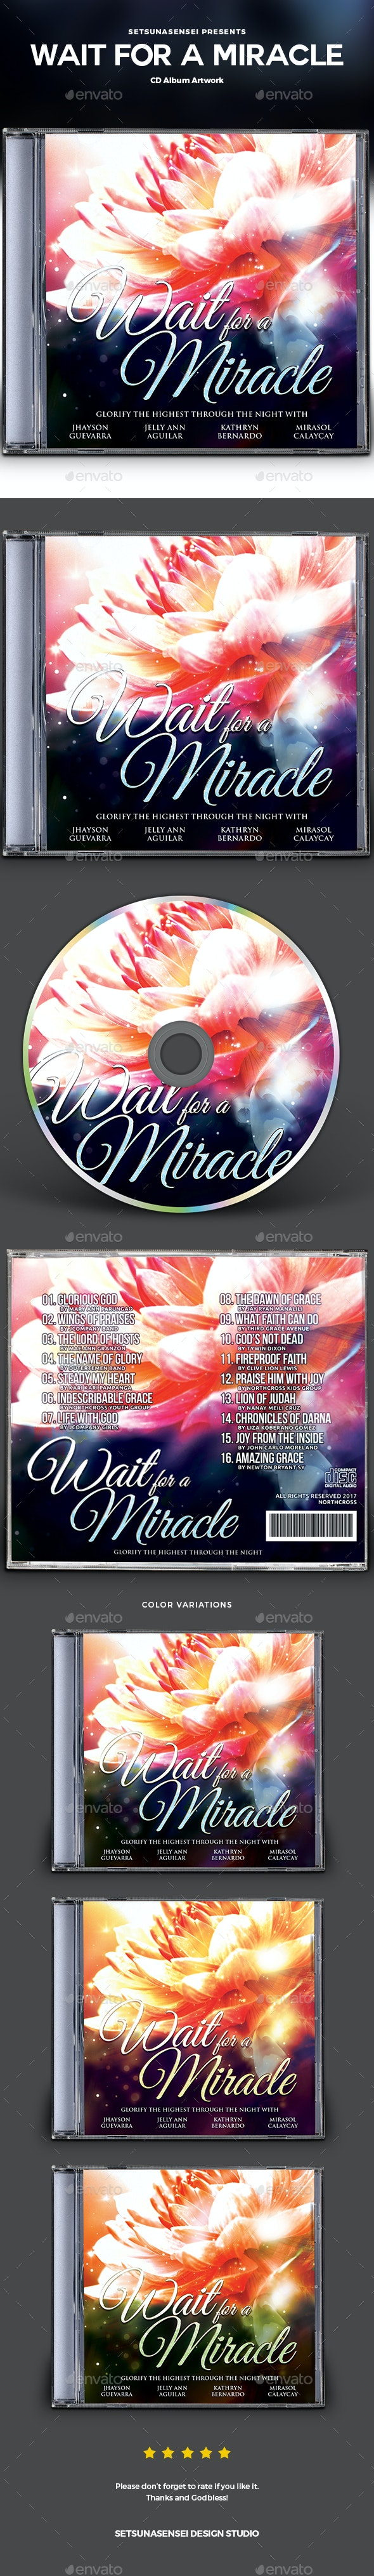 Wait for a Miracle CD Album Artwork - CD & DVD Artwork Print Templates